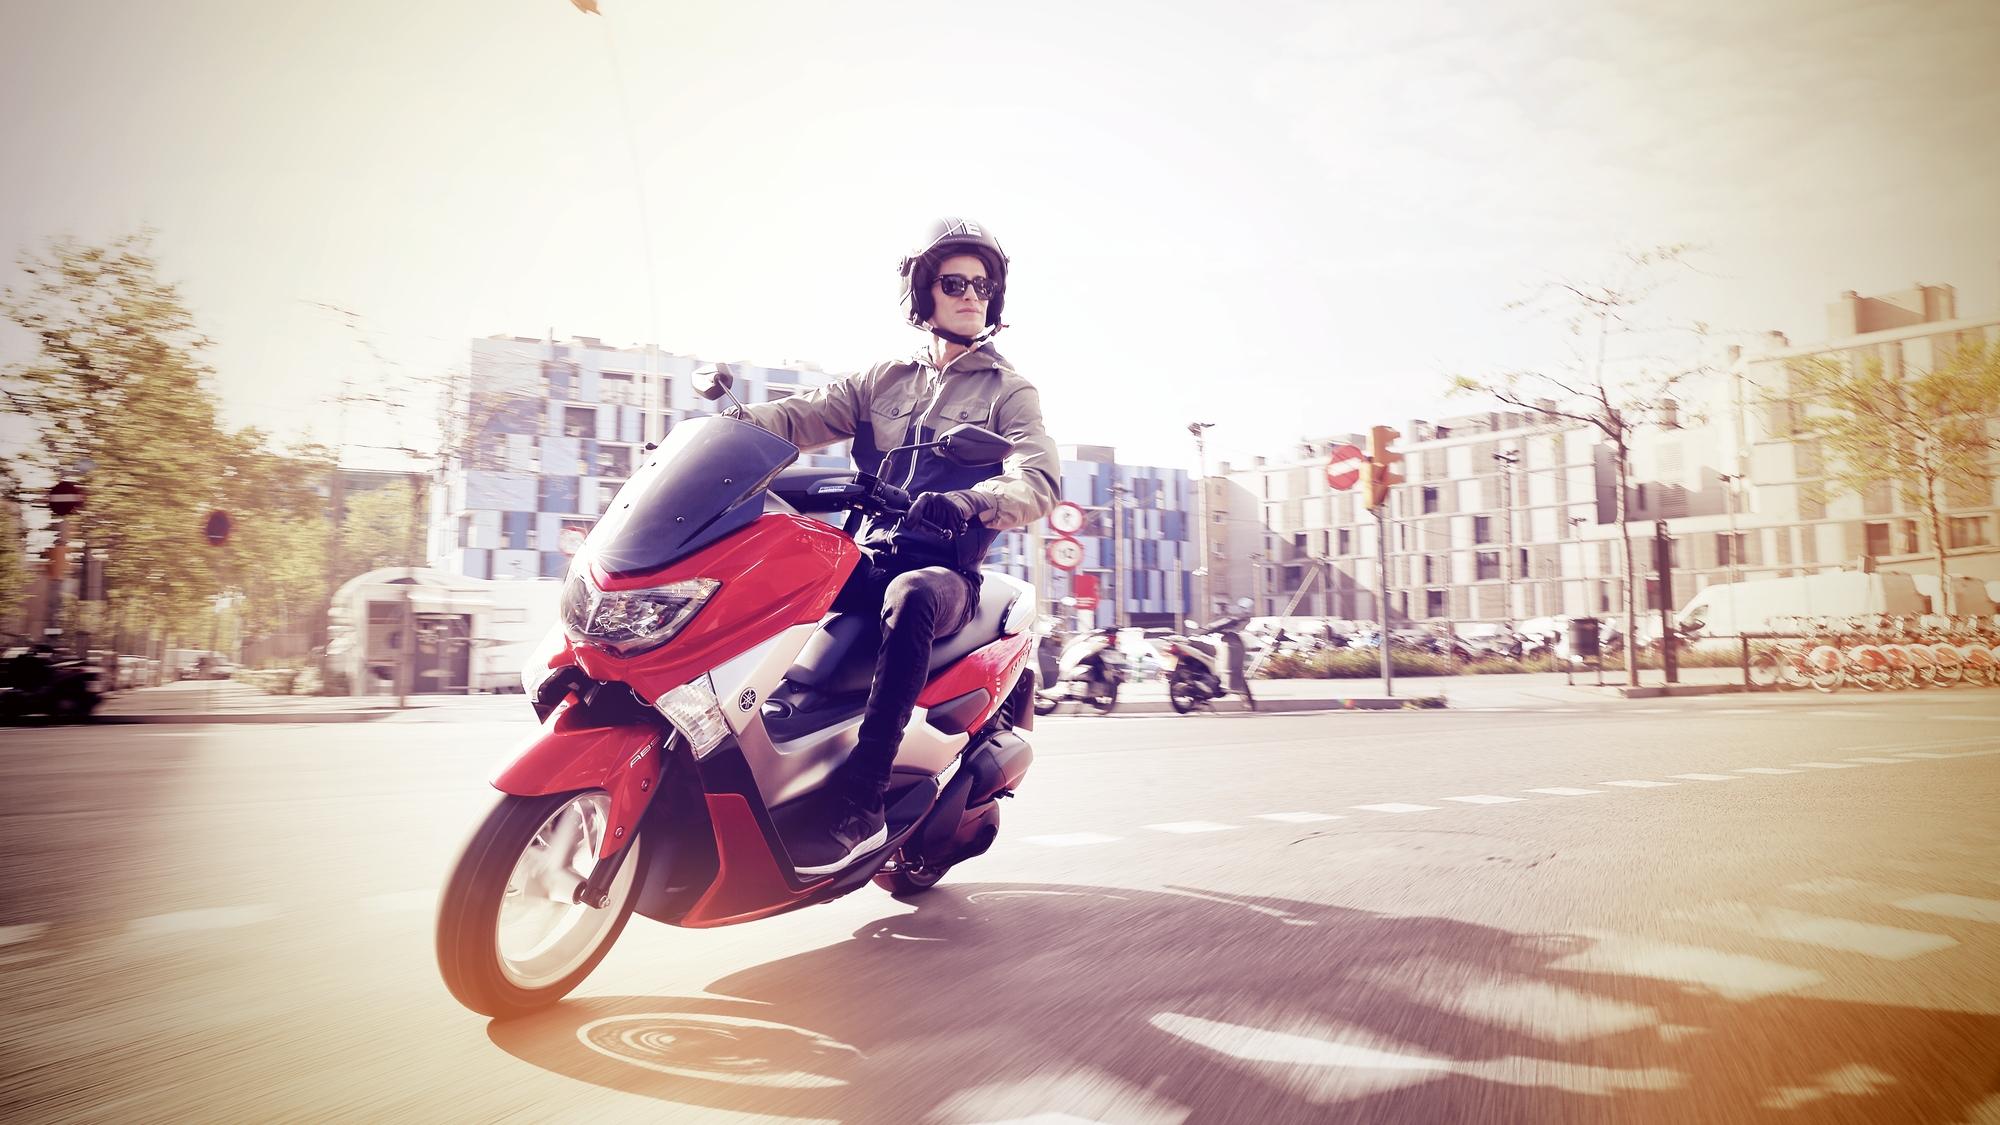 2015 Yamaha G125YM EU Power Red Action 002 - Yamaha NMAX